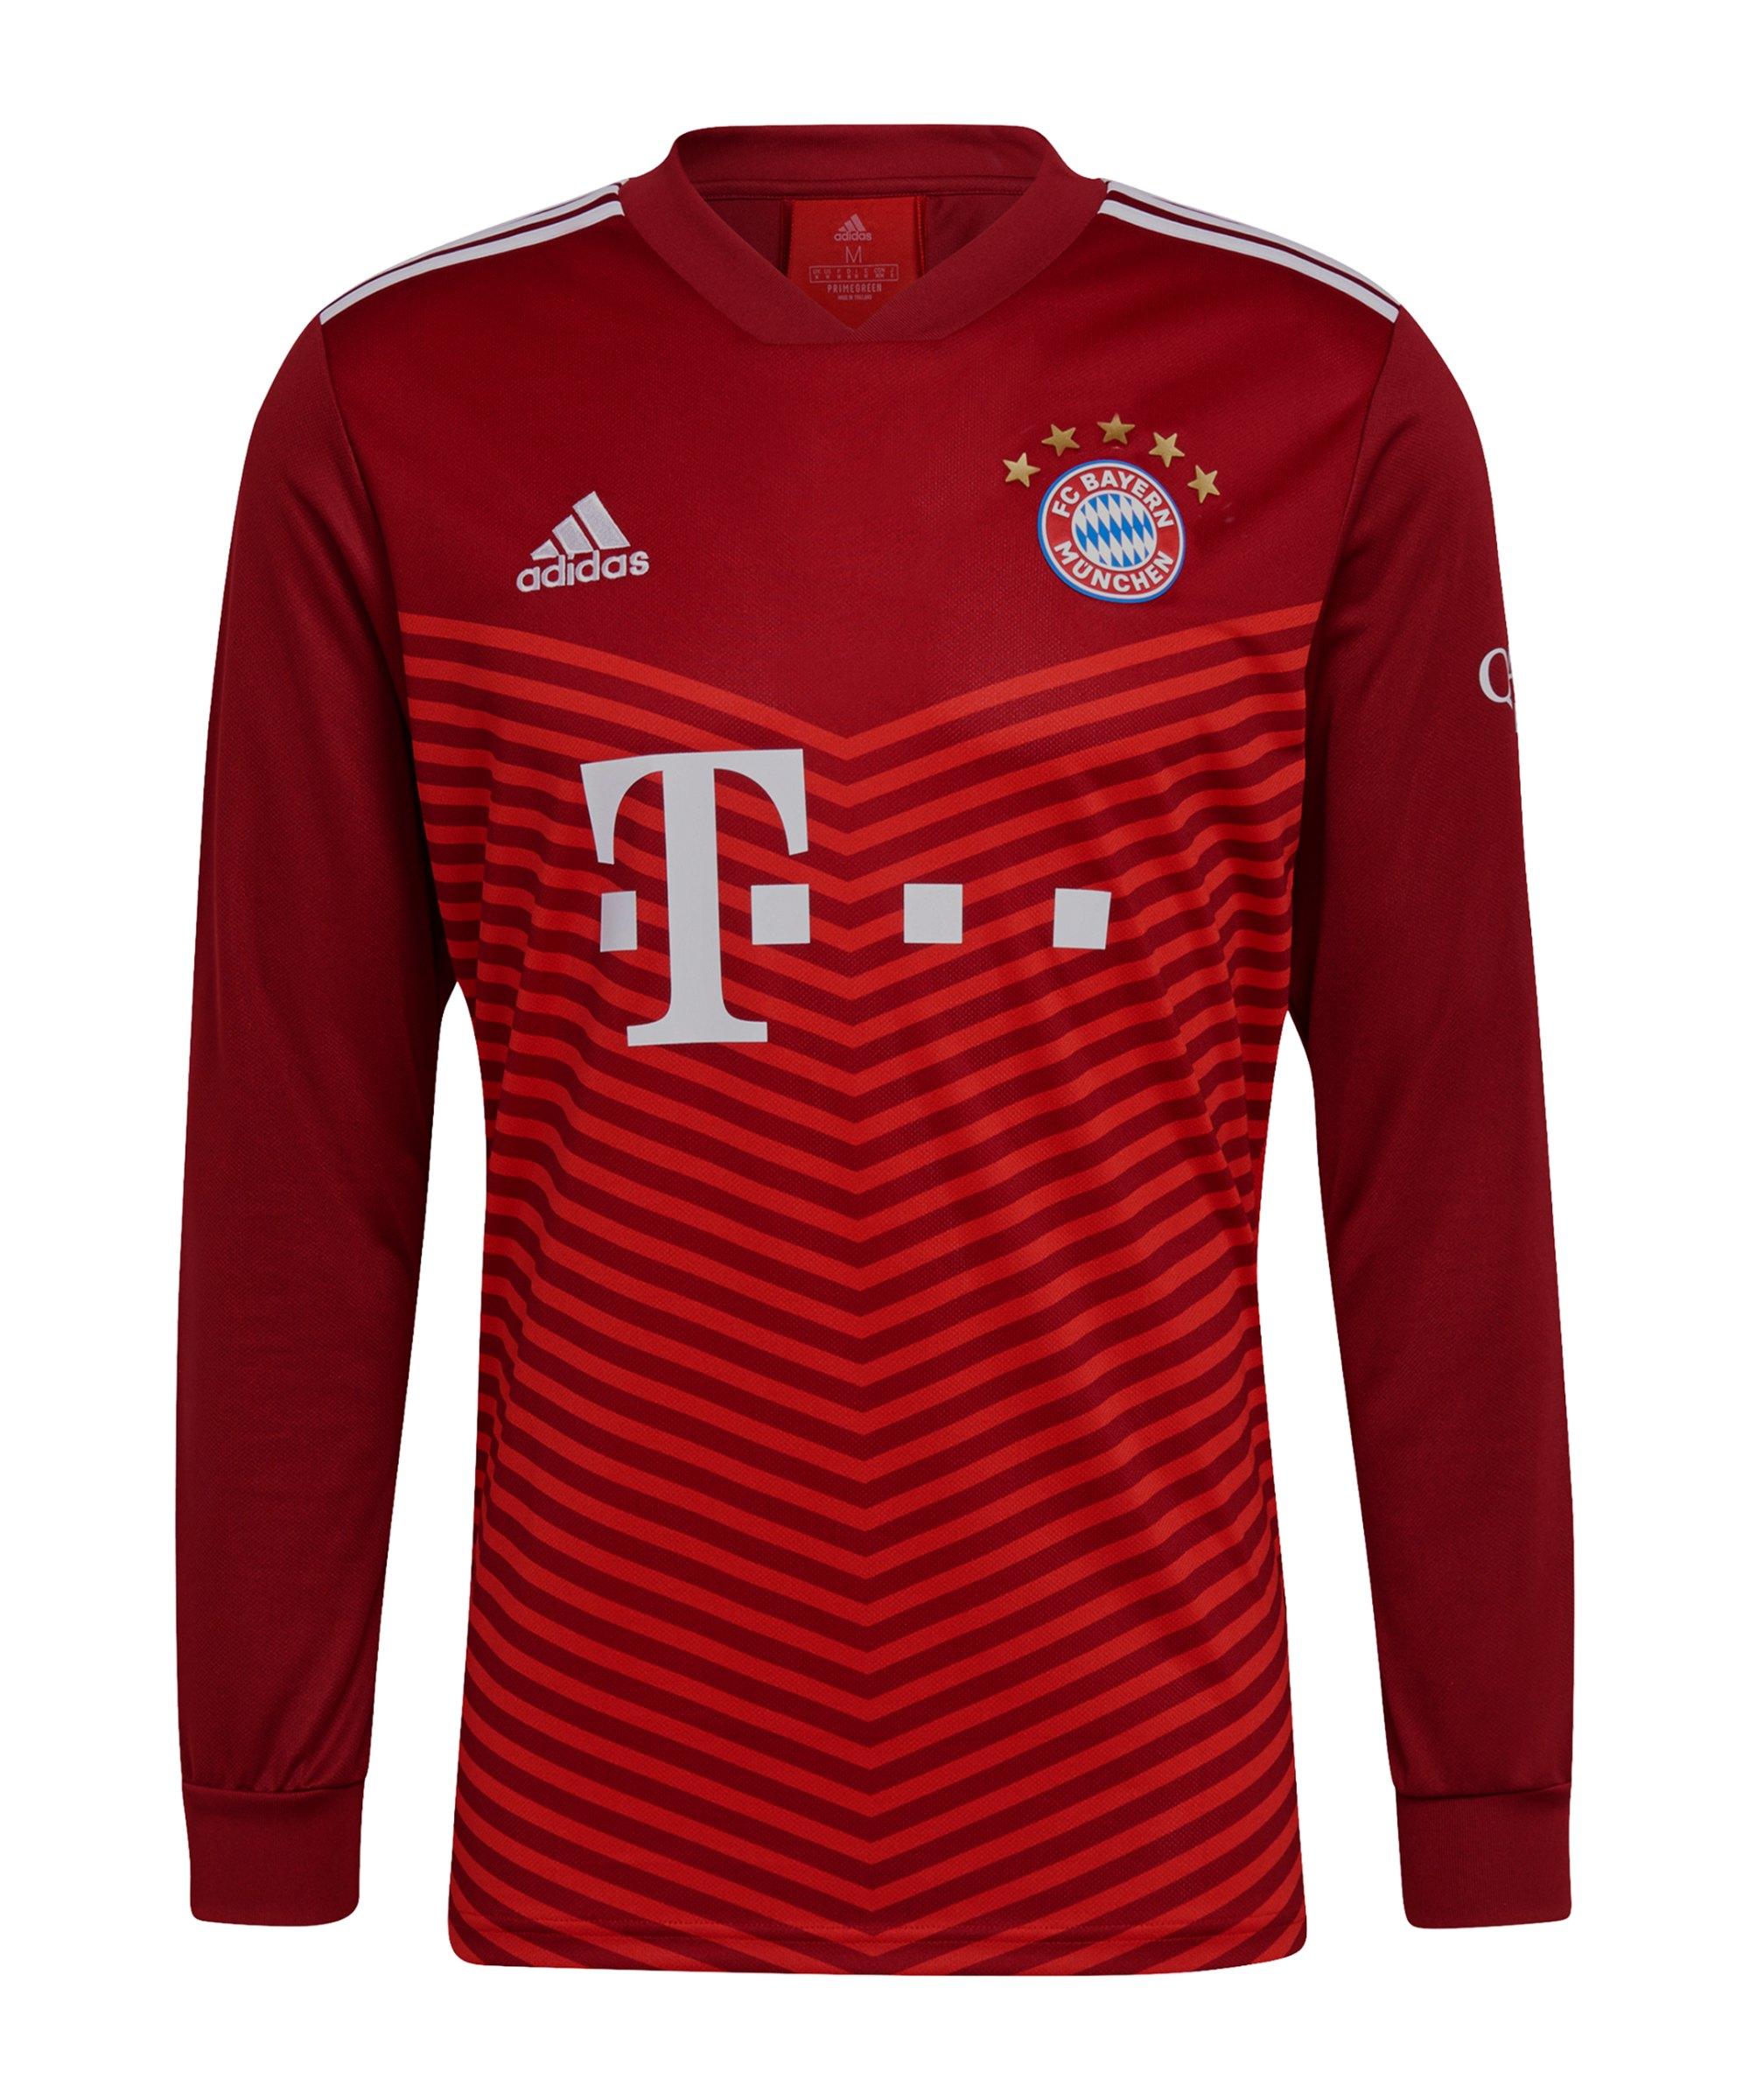 adidas FC Bayern München langarm Trikot Home 2021/2022 Rot - rot